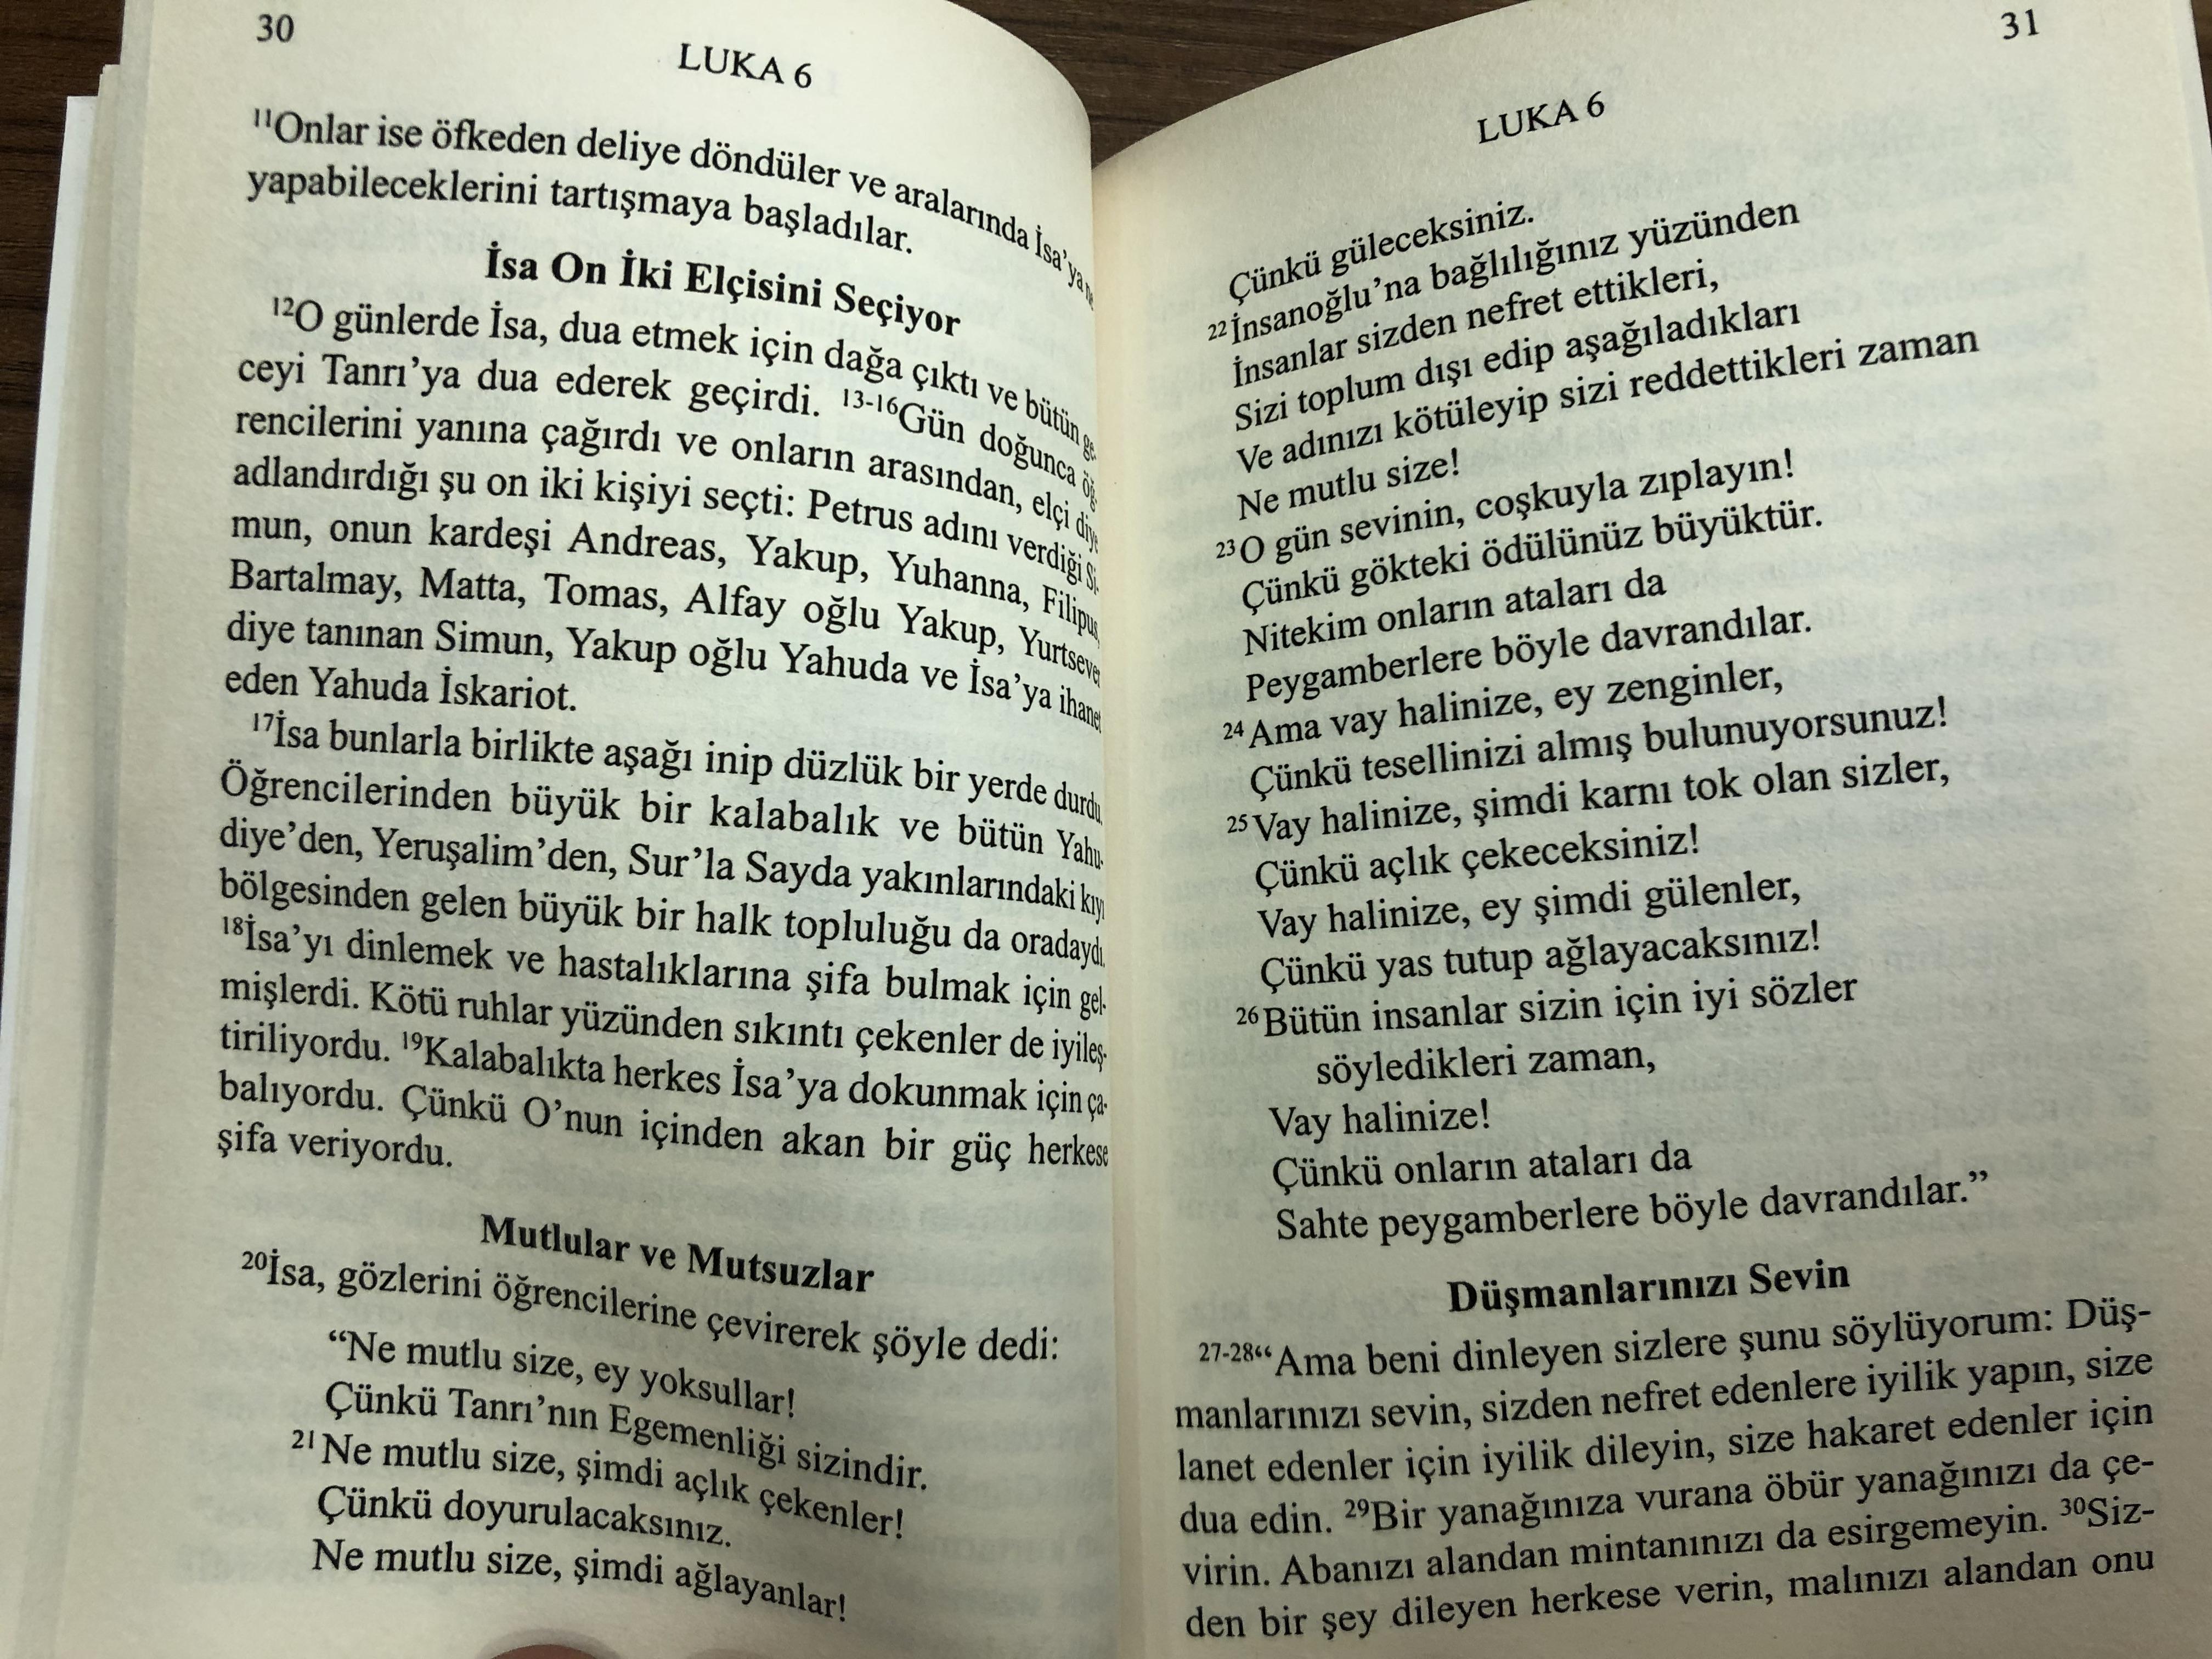 -ncil-luka-the-gospel-according-to-luke-in-turkish-language4.jpg